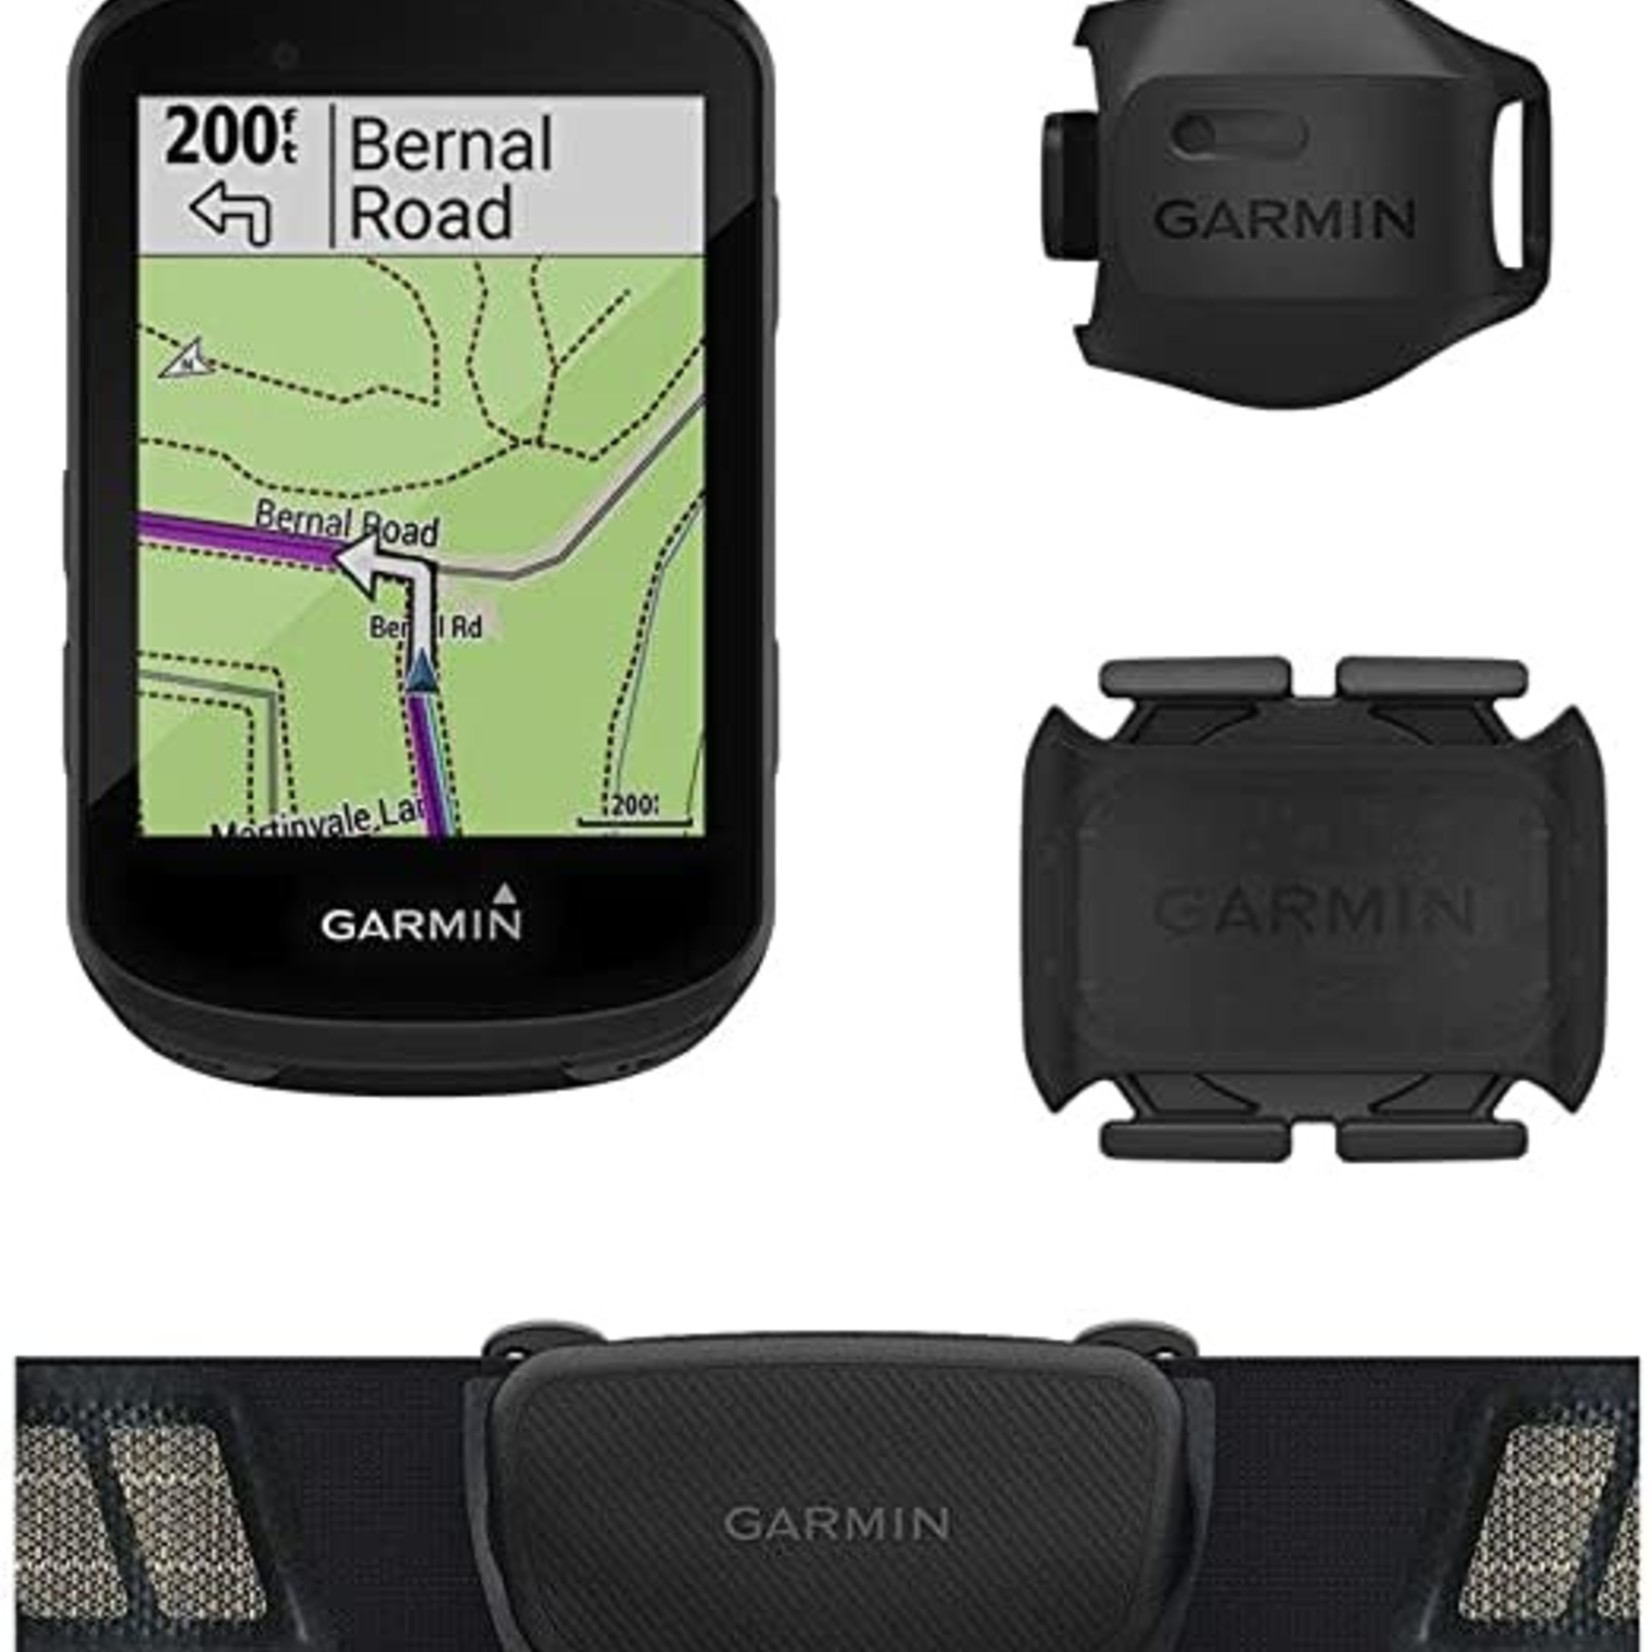 Garmin Garmin, Edge 530 Bundle, Computer, GPS: Yes, HR: Yes (Chest), Cadence: Yes, Black